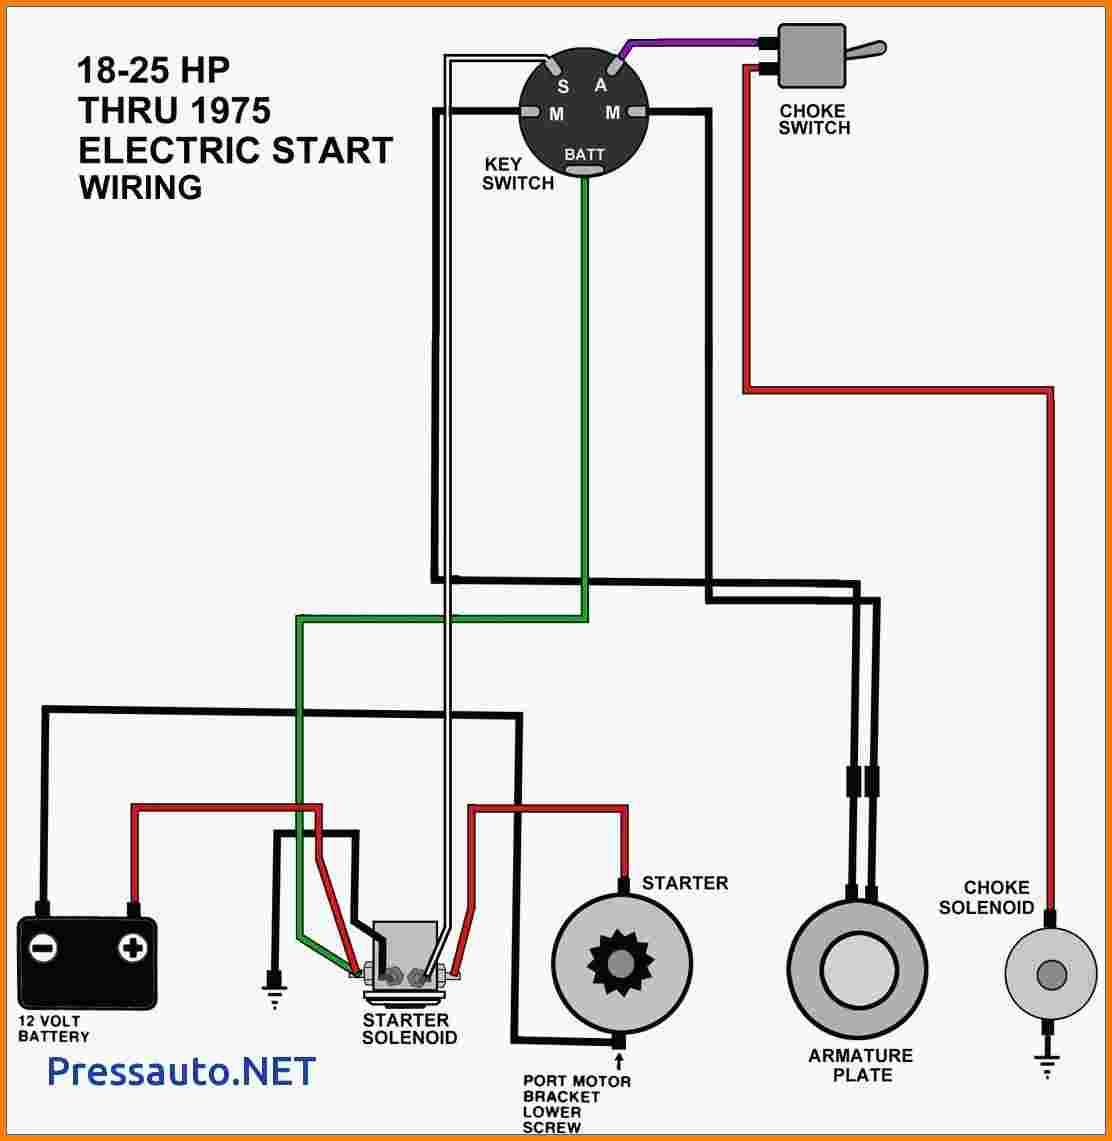 hight resolution of briggs amp stratton kill switch wiring diagram wiring diagrambriggs amp stratton kill switch wiring diagram wiring